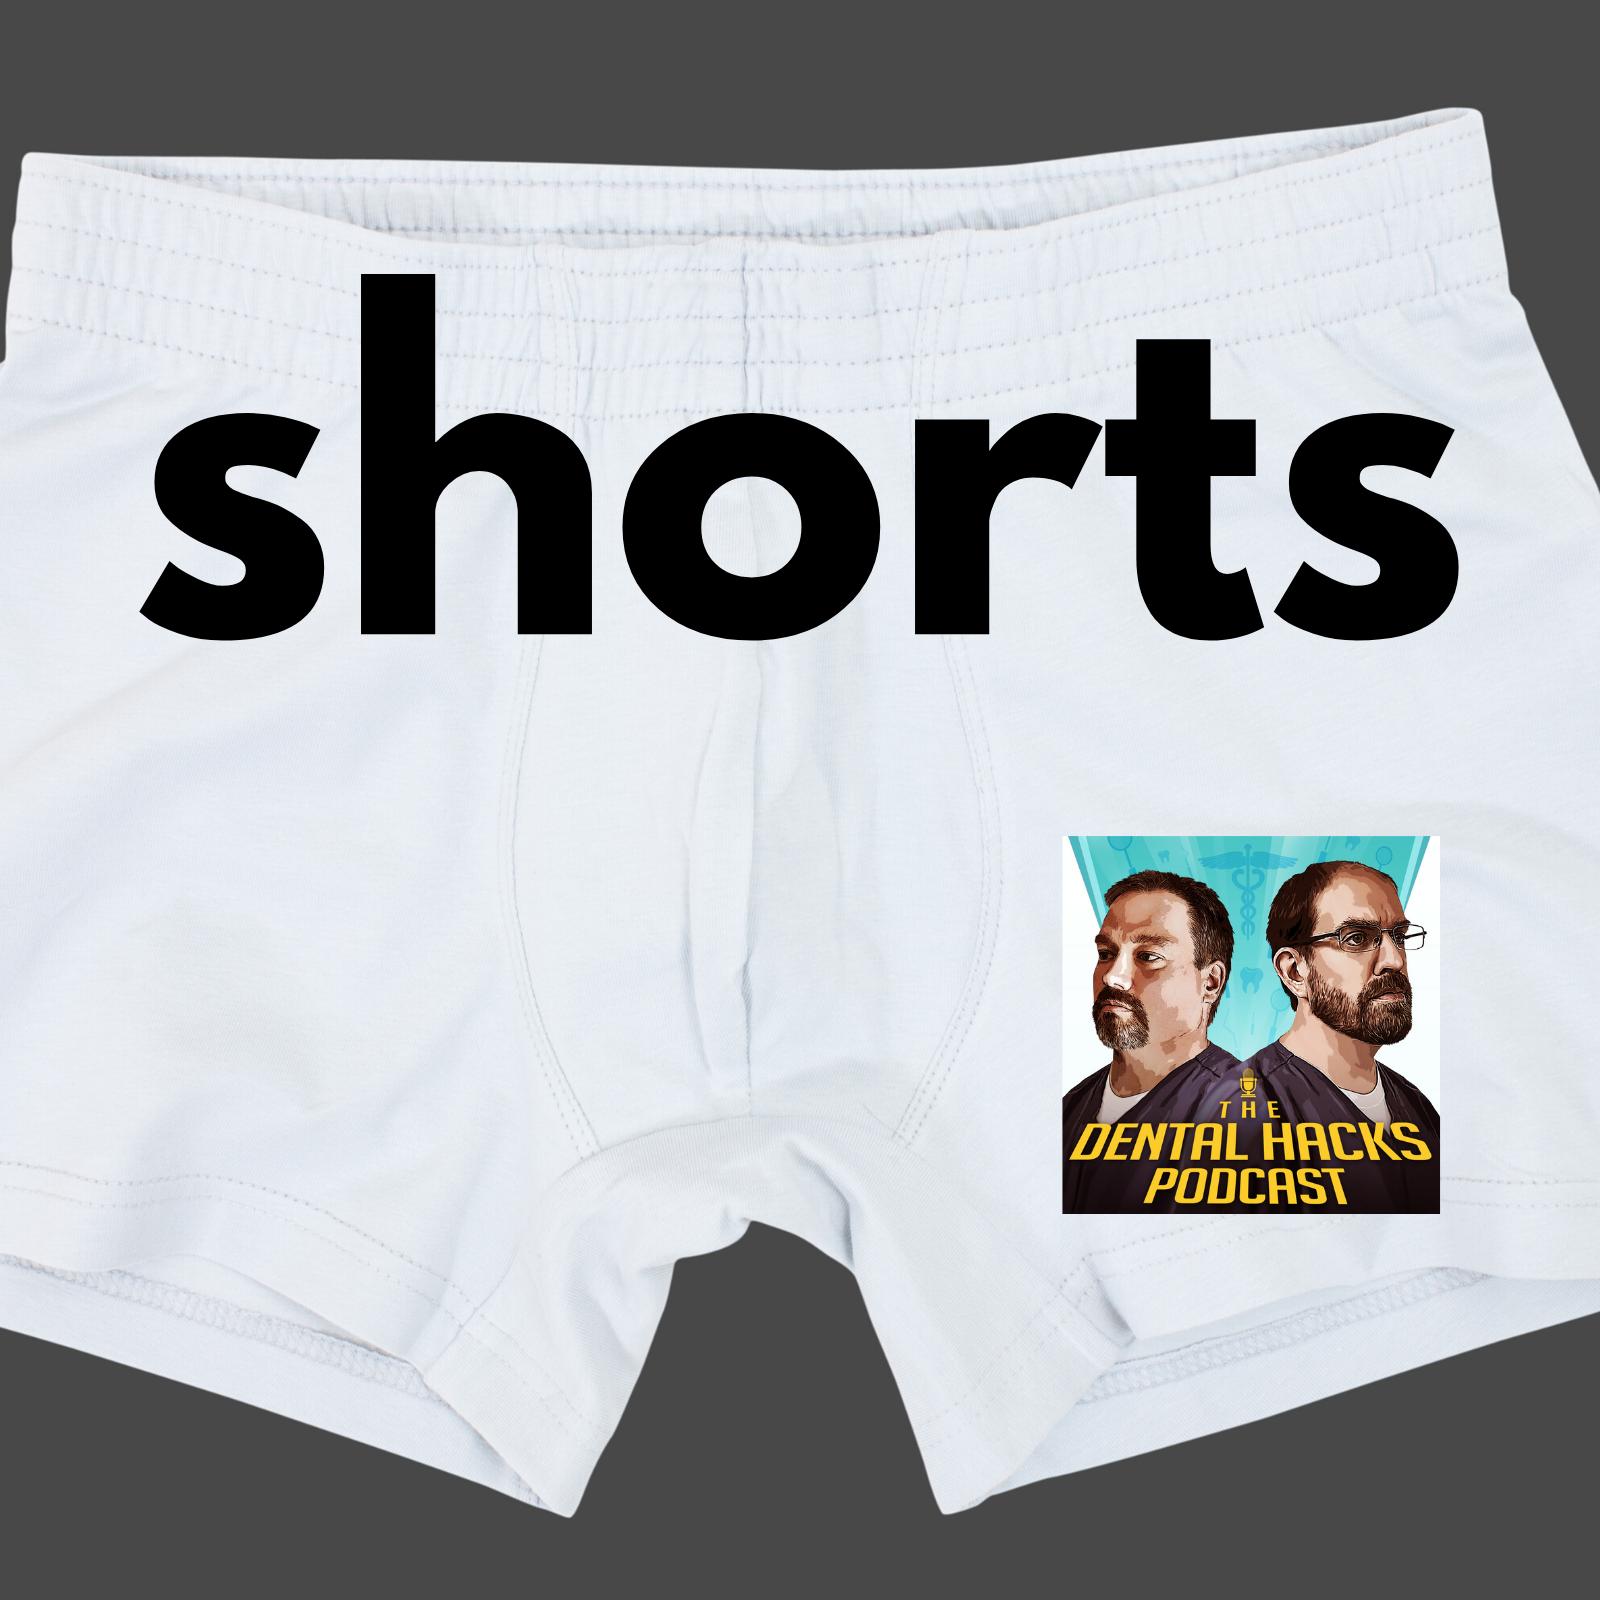 Introducing Dental Hacks Shorts show art